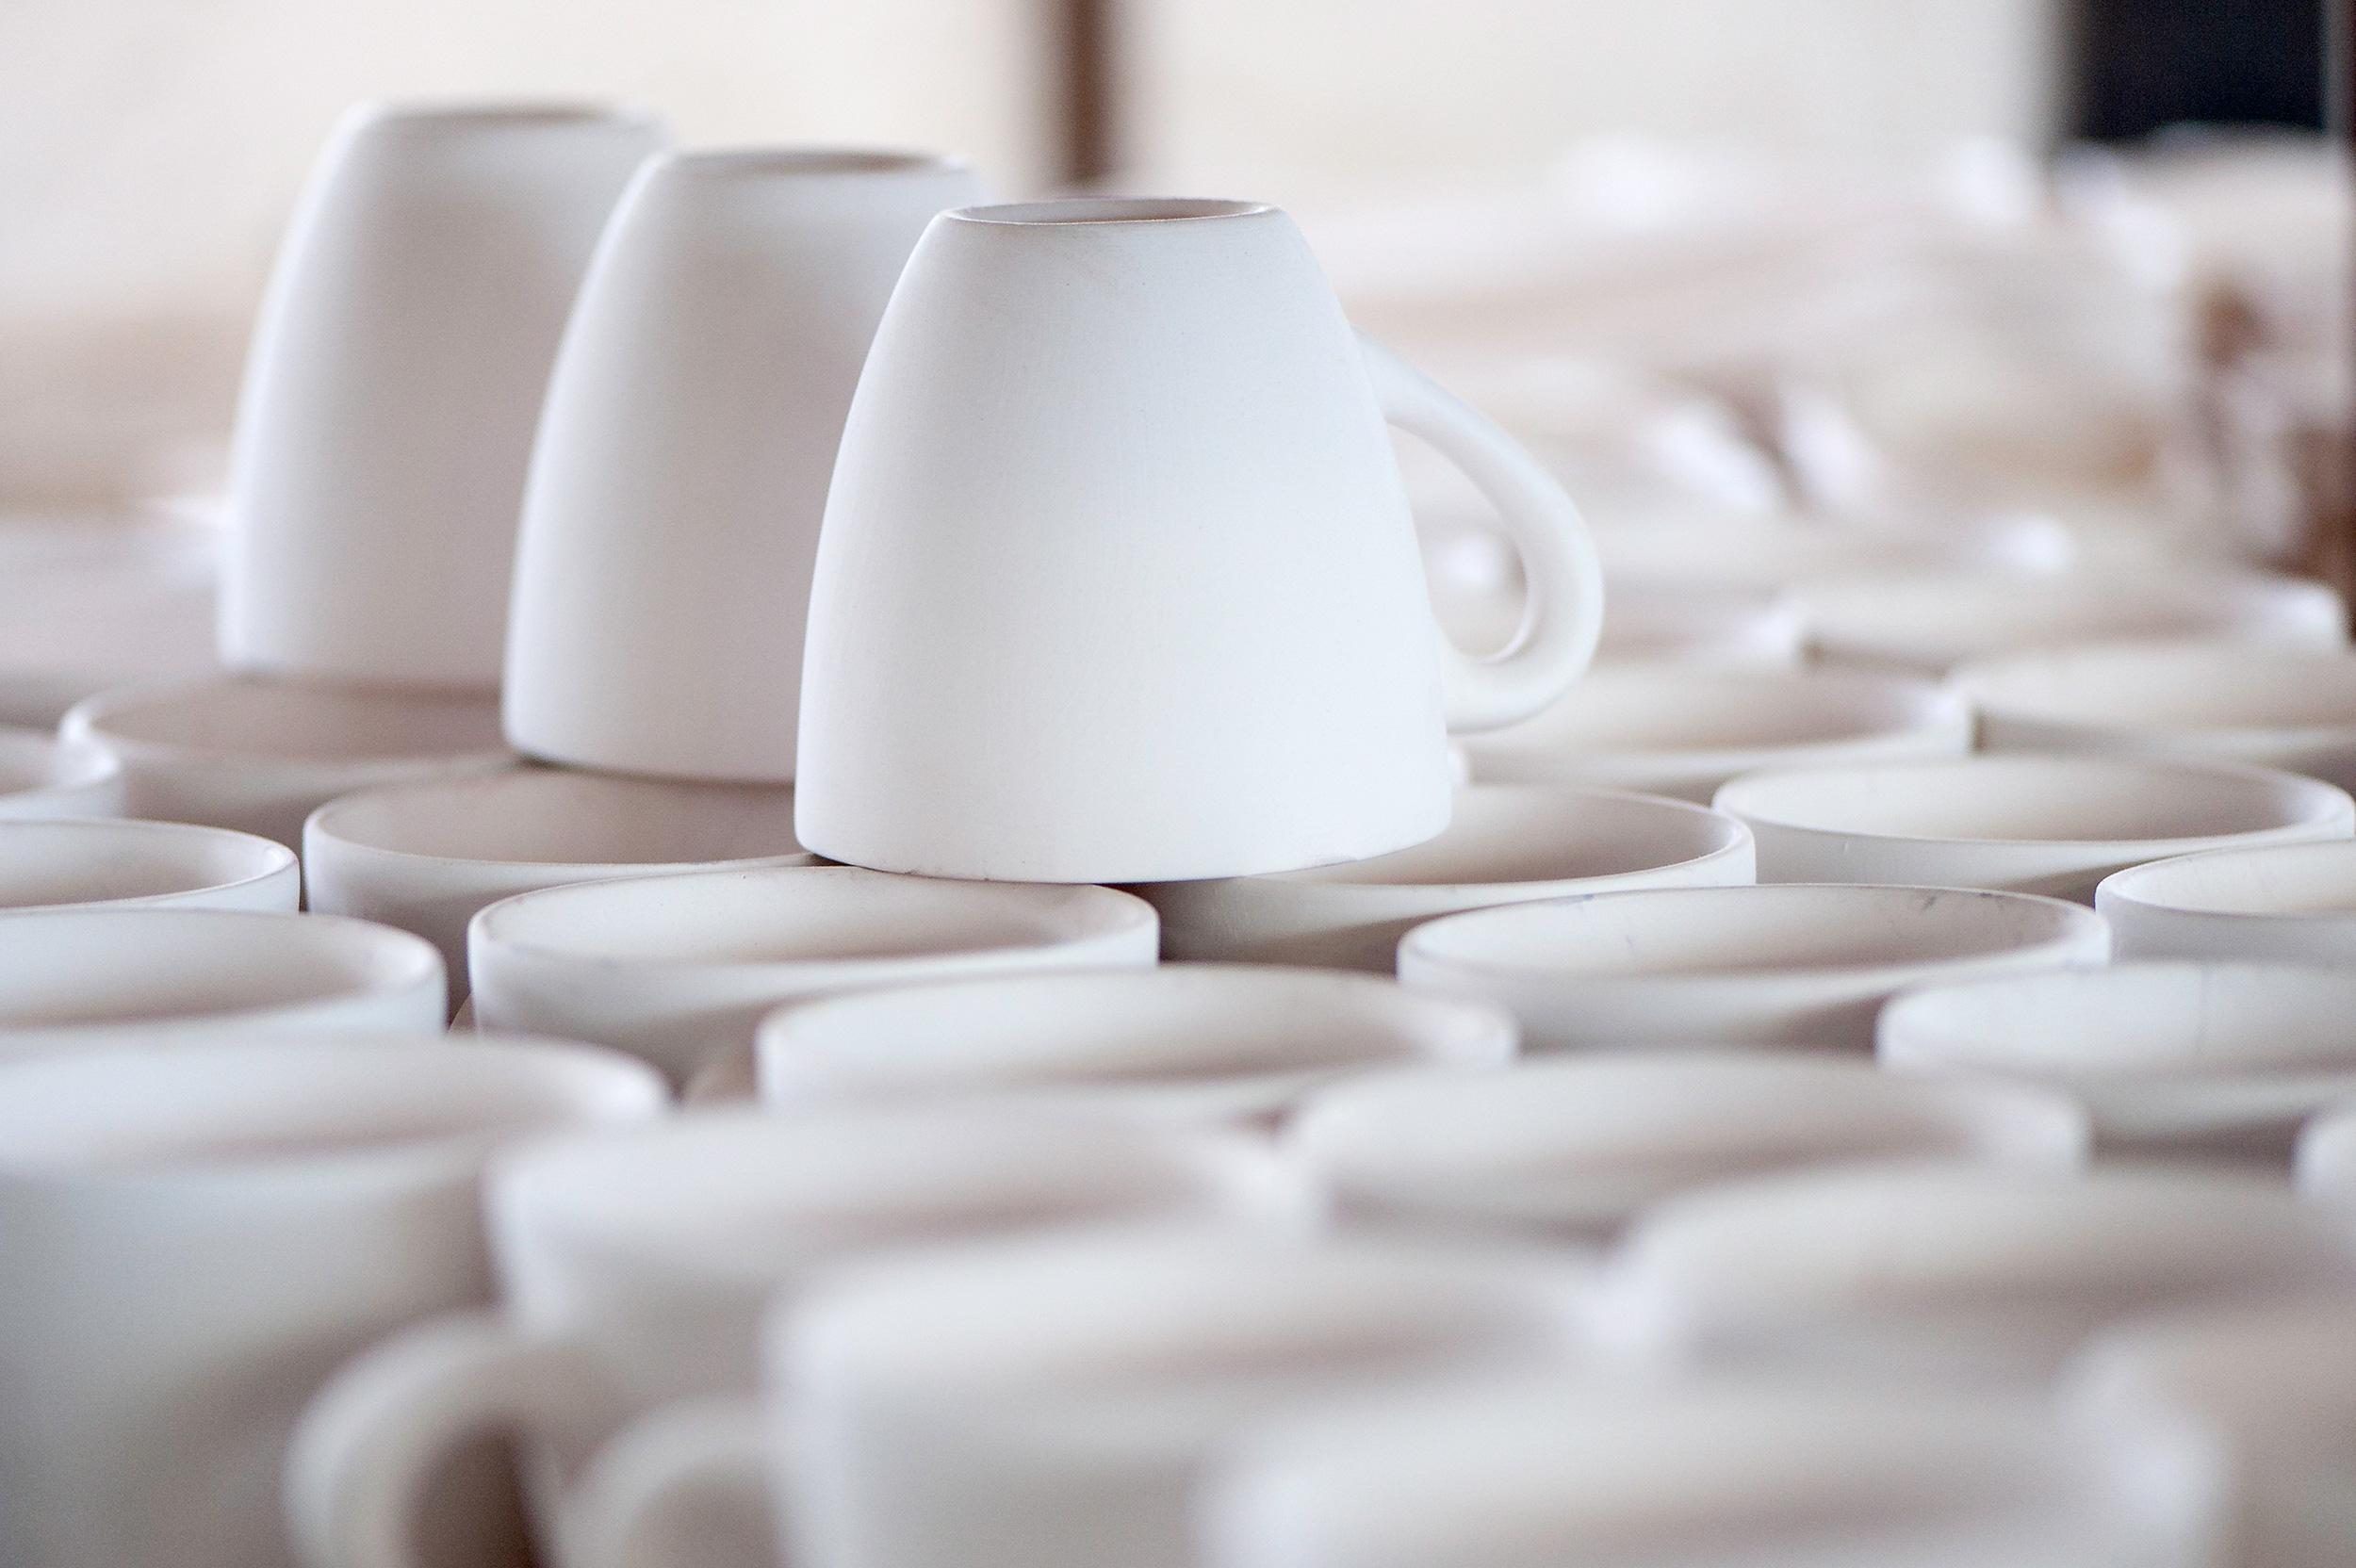 kapula-handmade-ceramics-plain-bisque-coffee-mugs.jpg